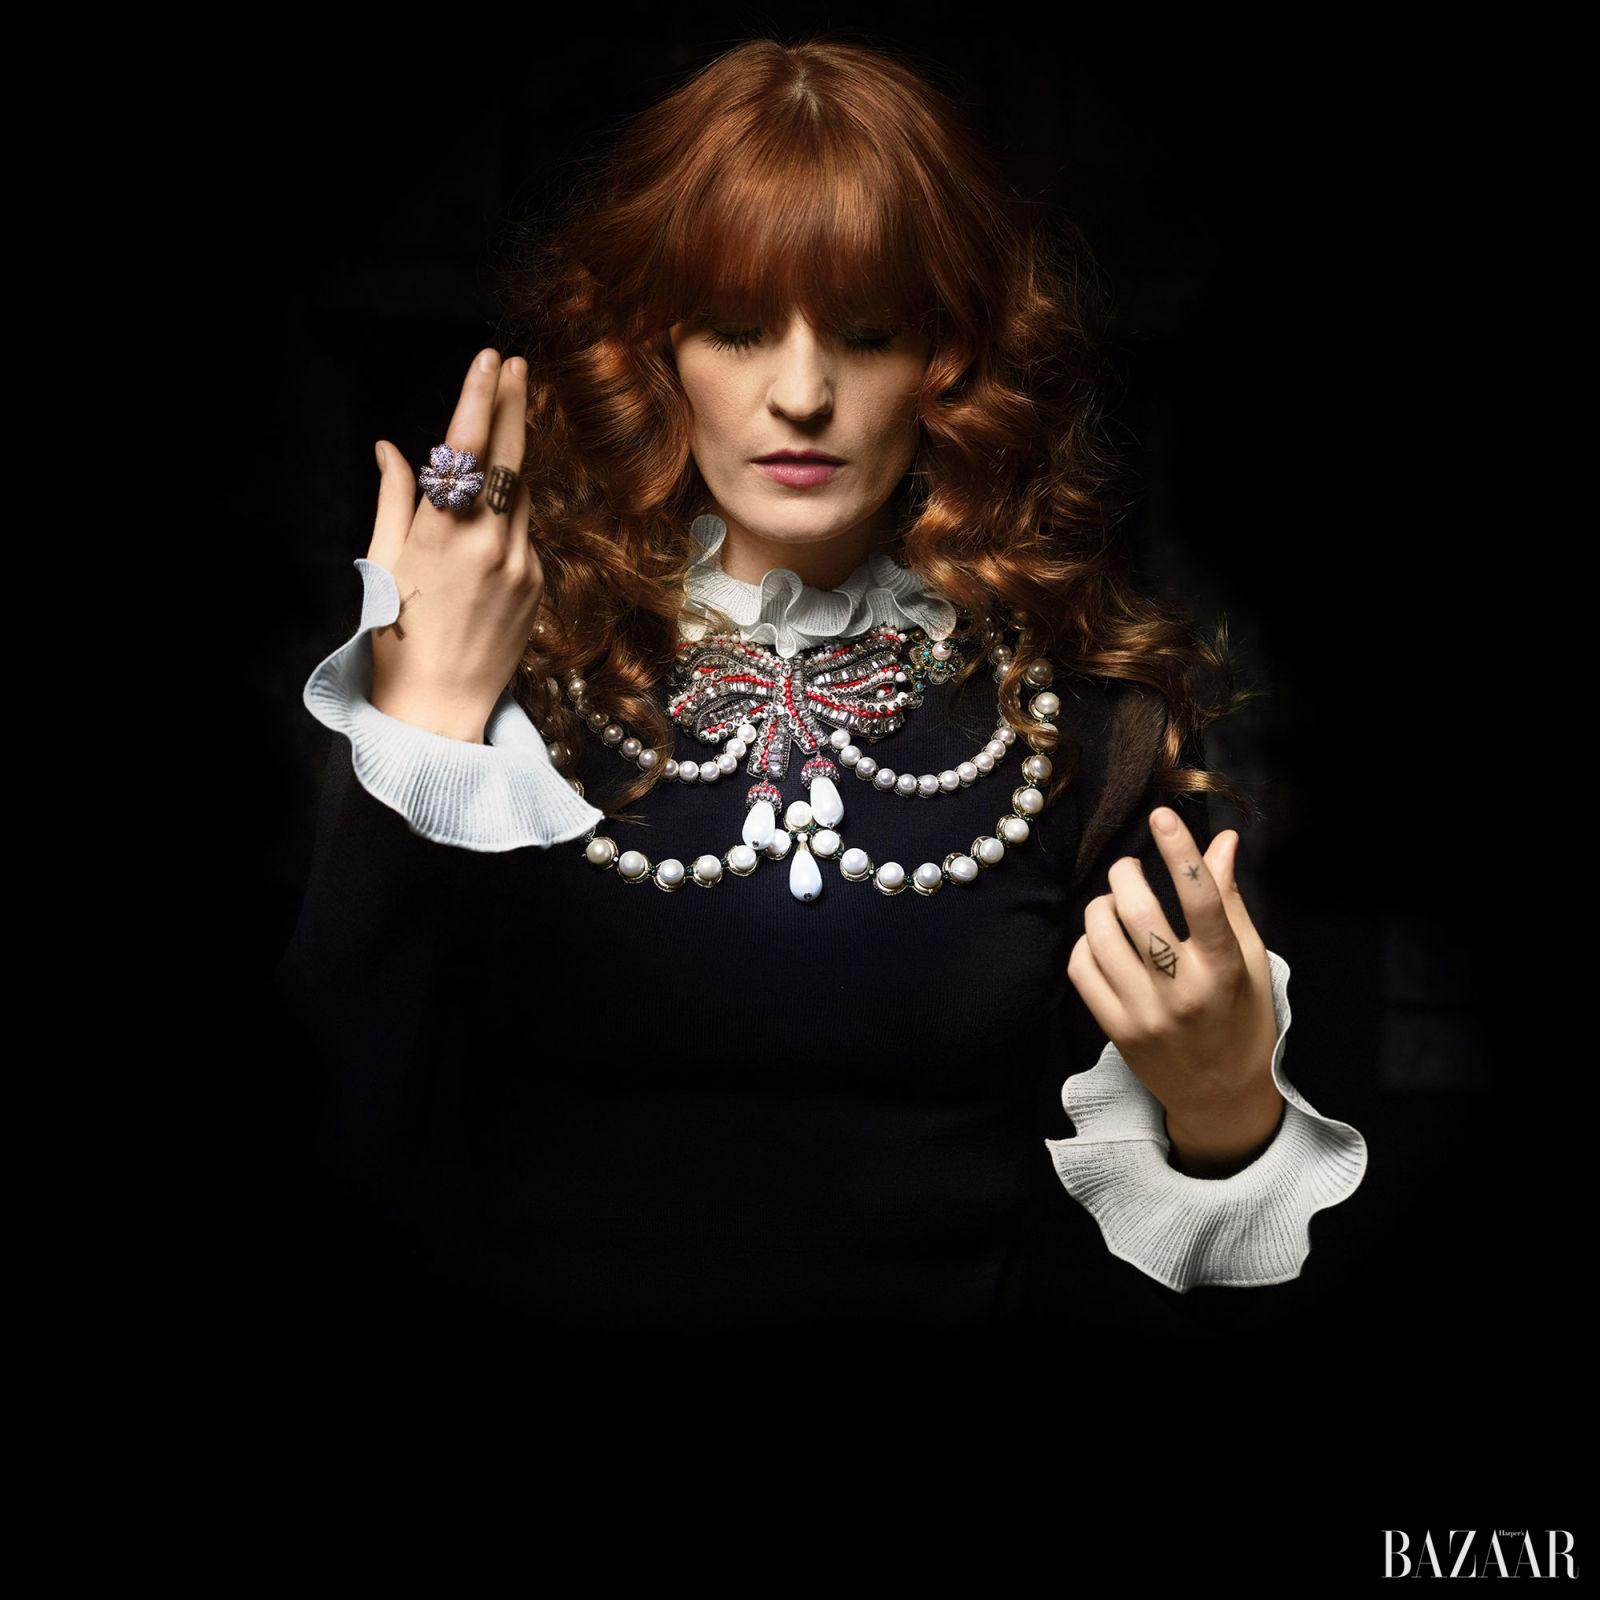 "<strong>Florence Welch </strong>미켈레와 오랜 우정을 이어가고 있는 뮤지션 플로렌스 웰치. 첫 만남부터 르네상스, 바로크에 대한 이야기를 논했을 정도로 취향이 잘 맞는다. 그의 표현을 빌리자면 플로렌스는 ""애인이 있는지 판단이 불가능한, 취향이 좋은 지성인. 즉 정신적으로 해방된 여자""라고."